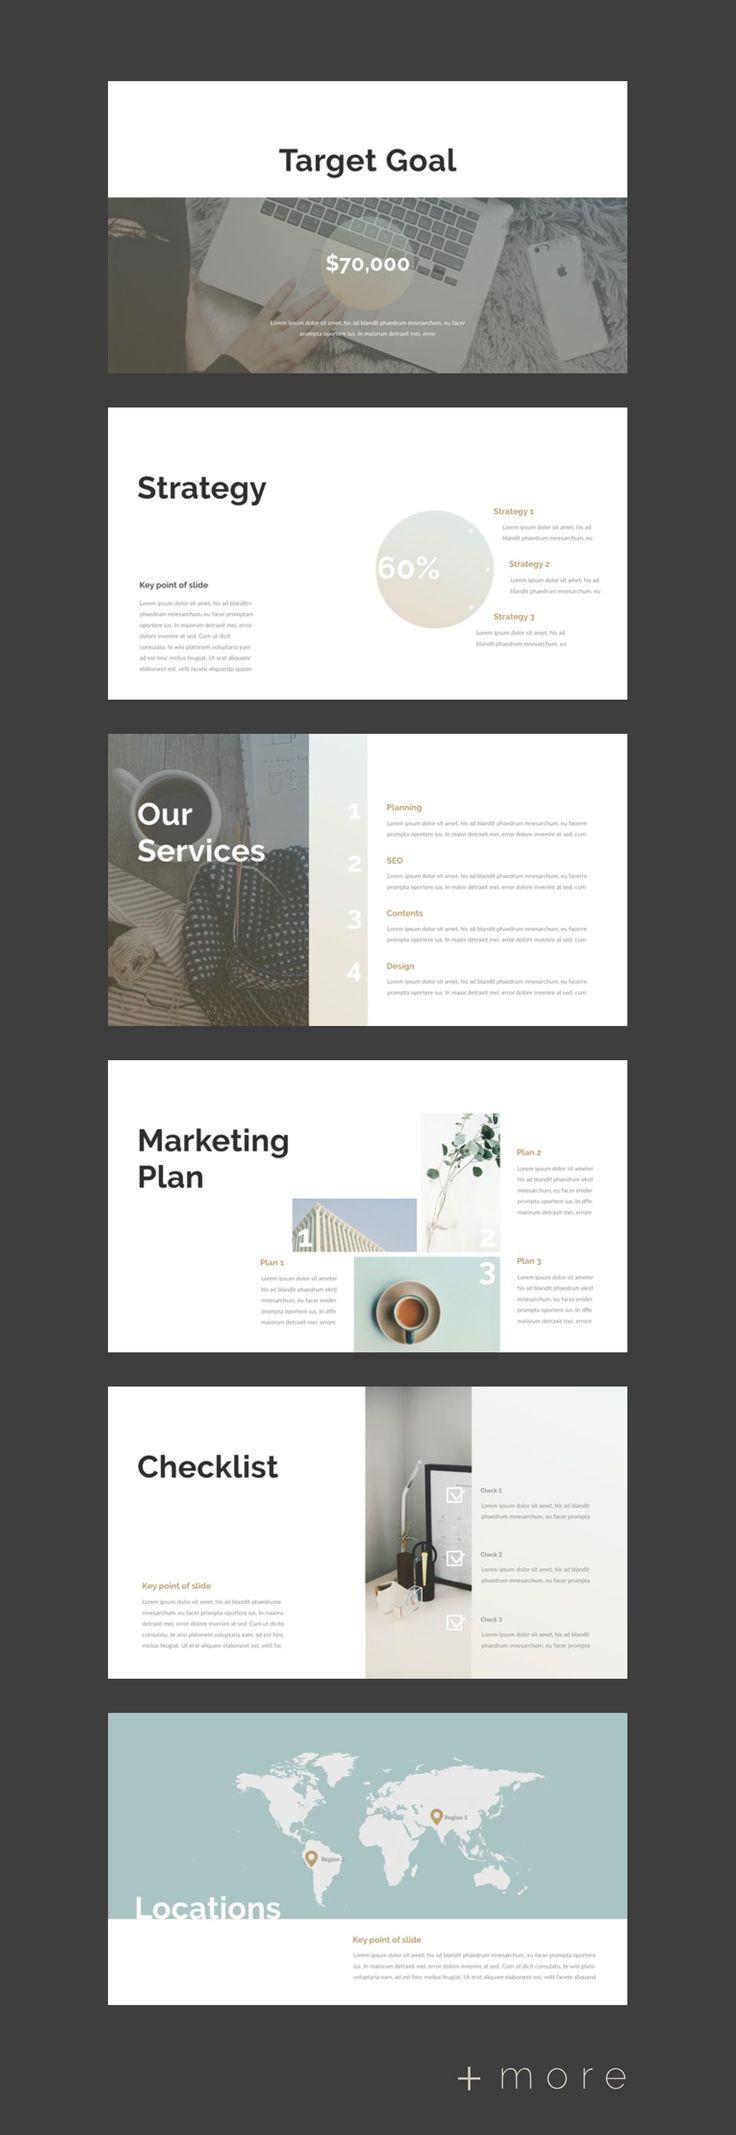 Planner presentation template - 2018 business planning #ppt #presentation